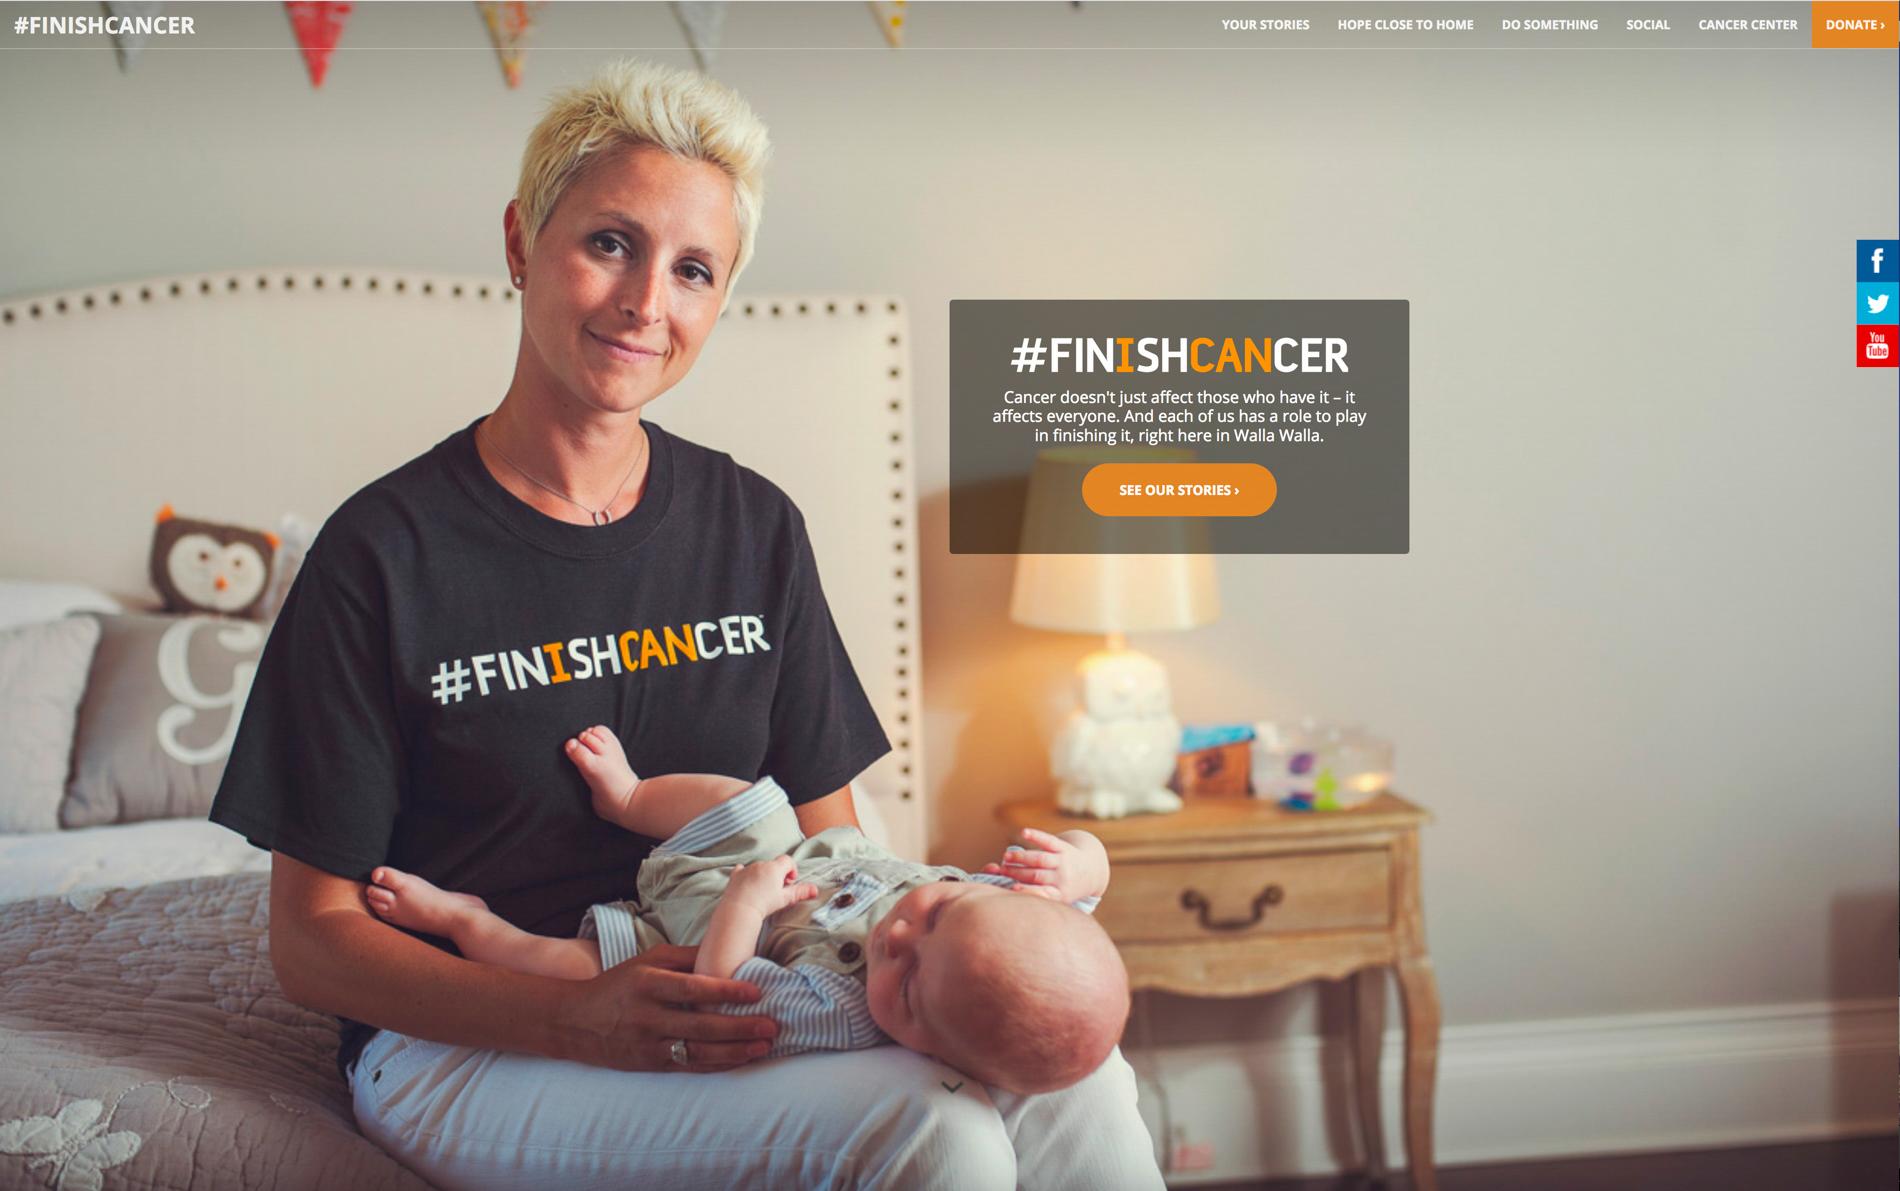 Finish Cancer Campaign